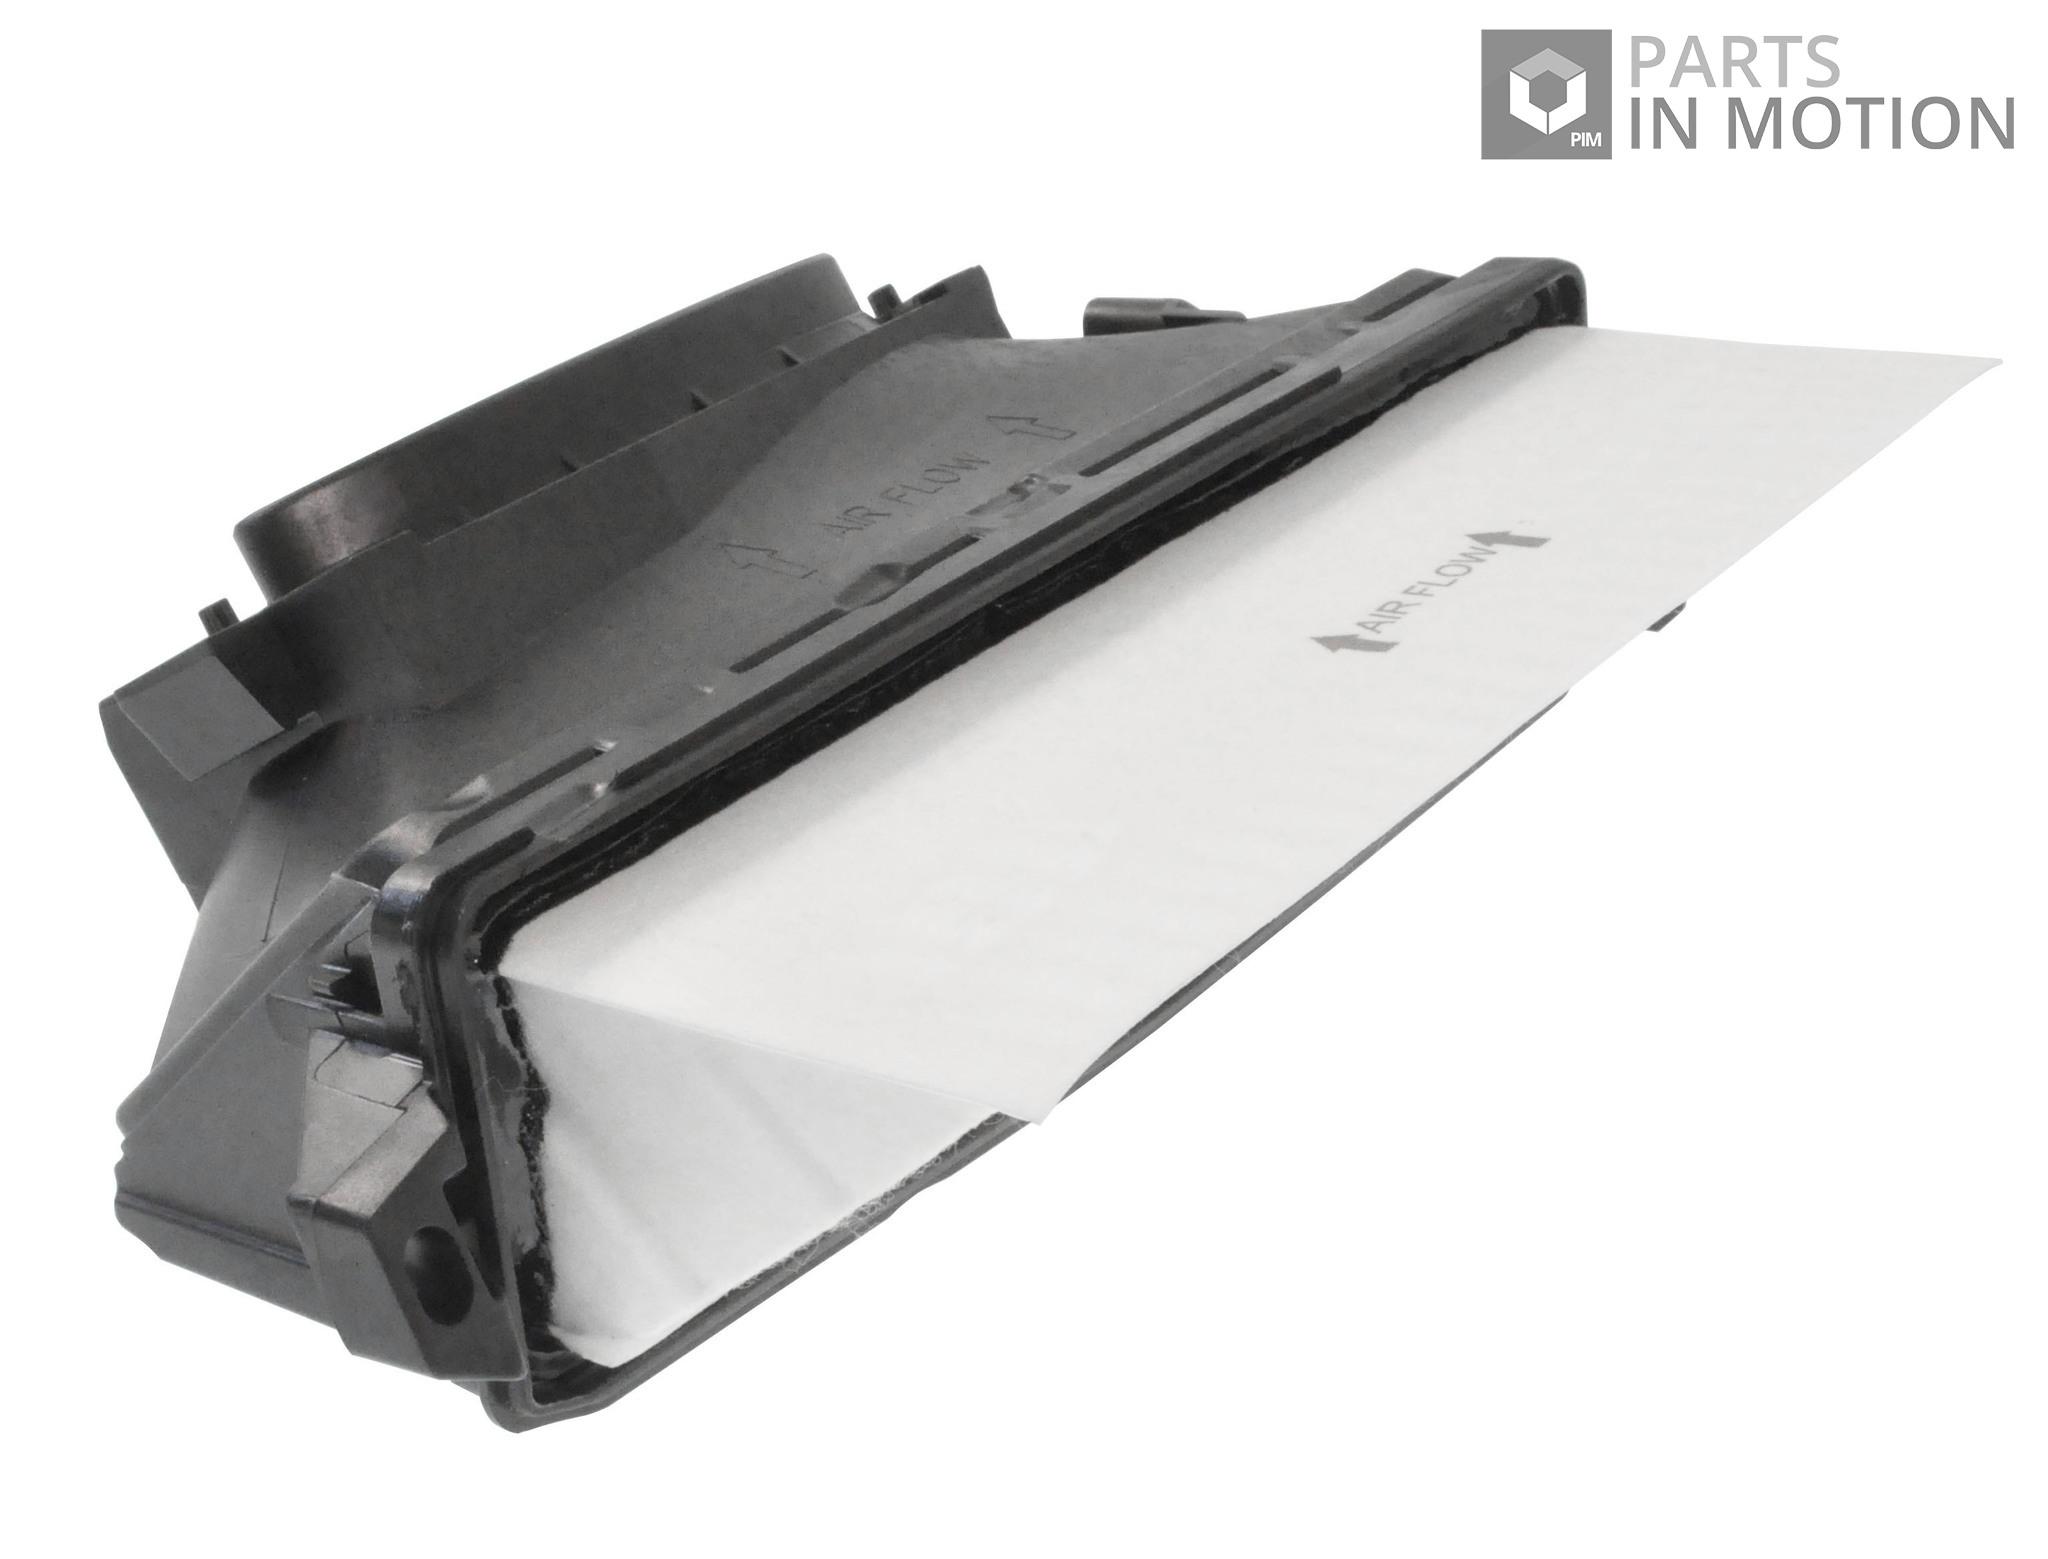 MERCEDES GL350 X164 3 0D Air Filter Left 2009 on OM642 820 ADL